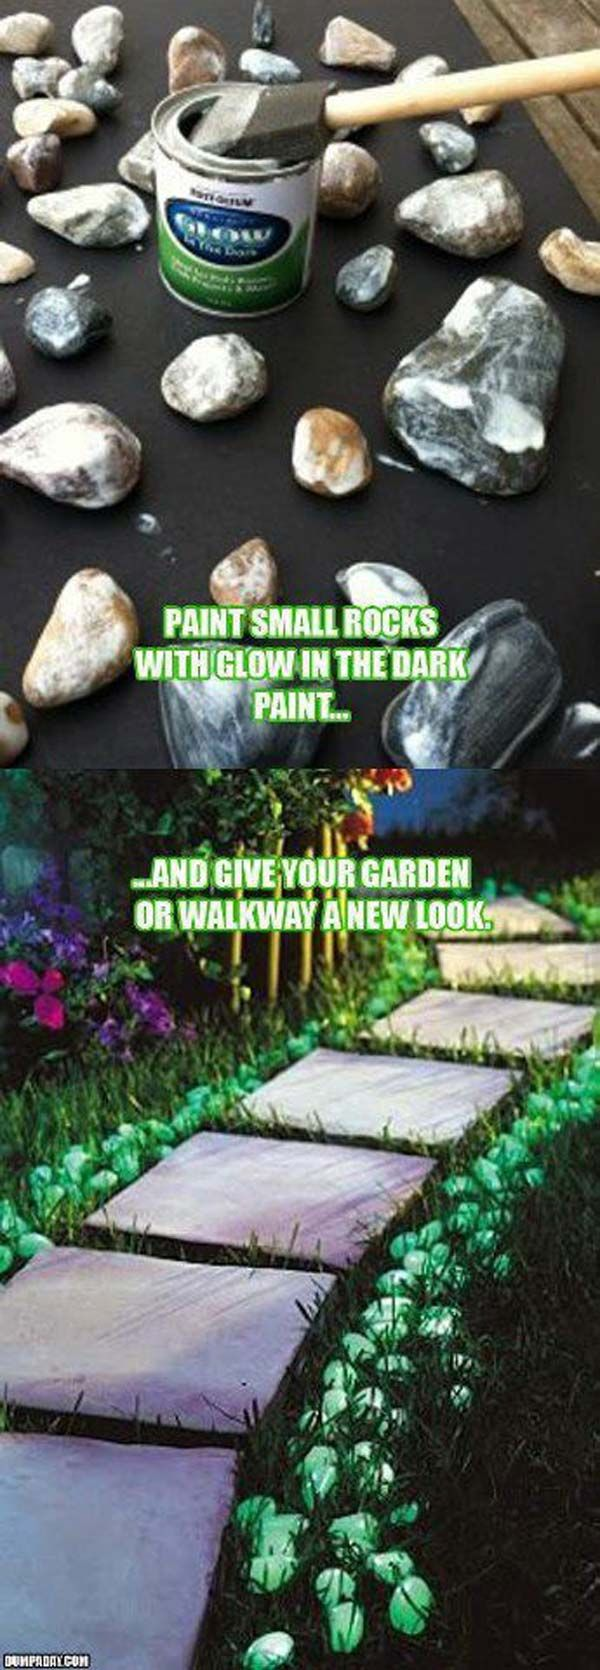 Fifteen İncredible DIY Garden Redecorating Ideas by using Rocks 7